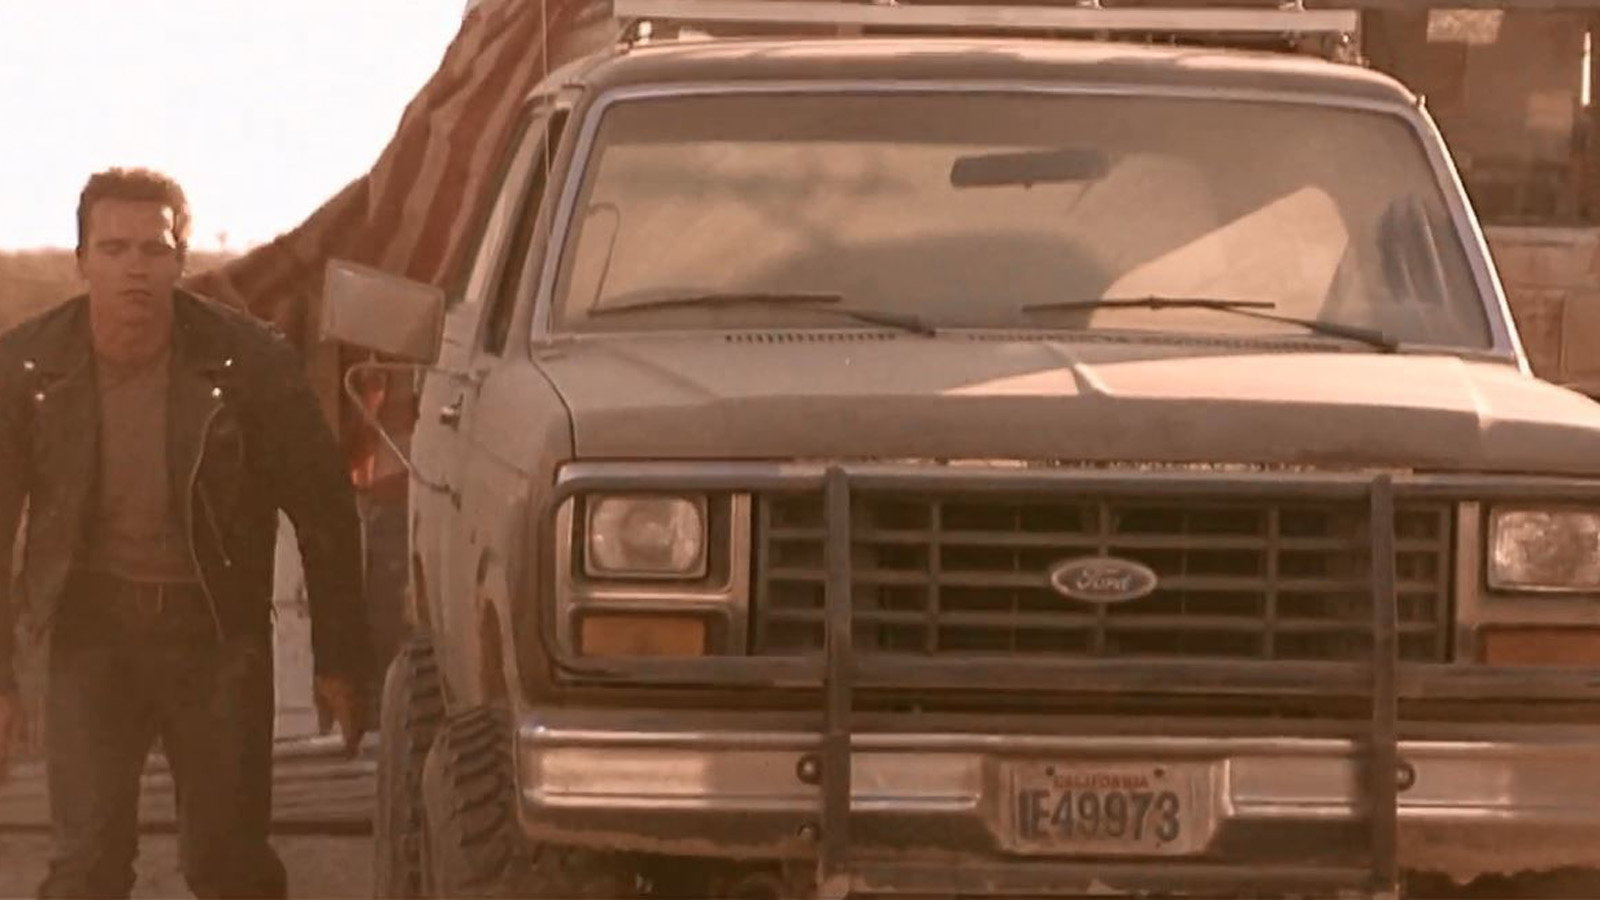 Terminator 2 Ford Bronco